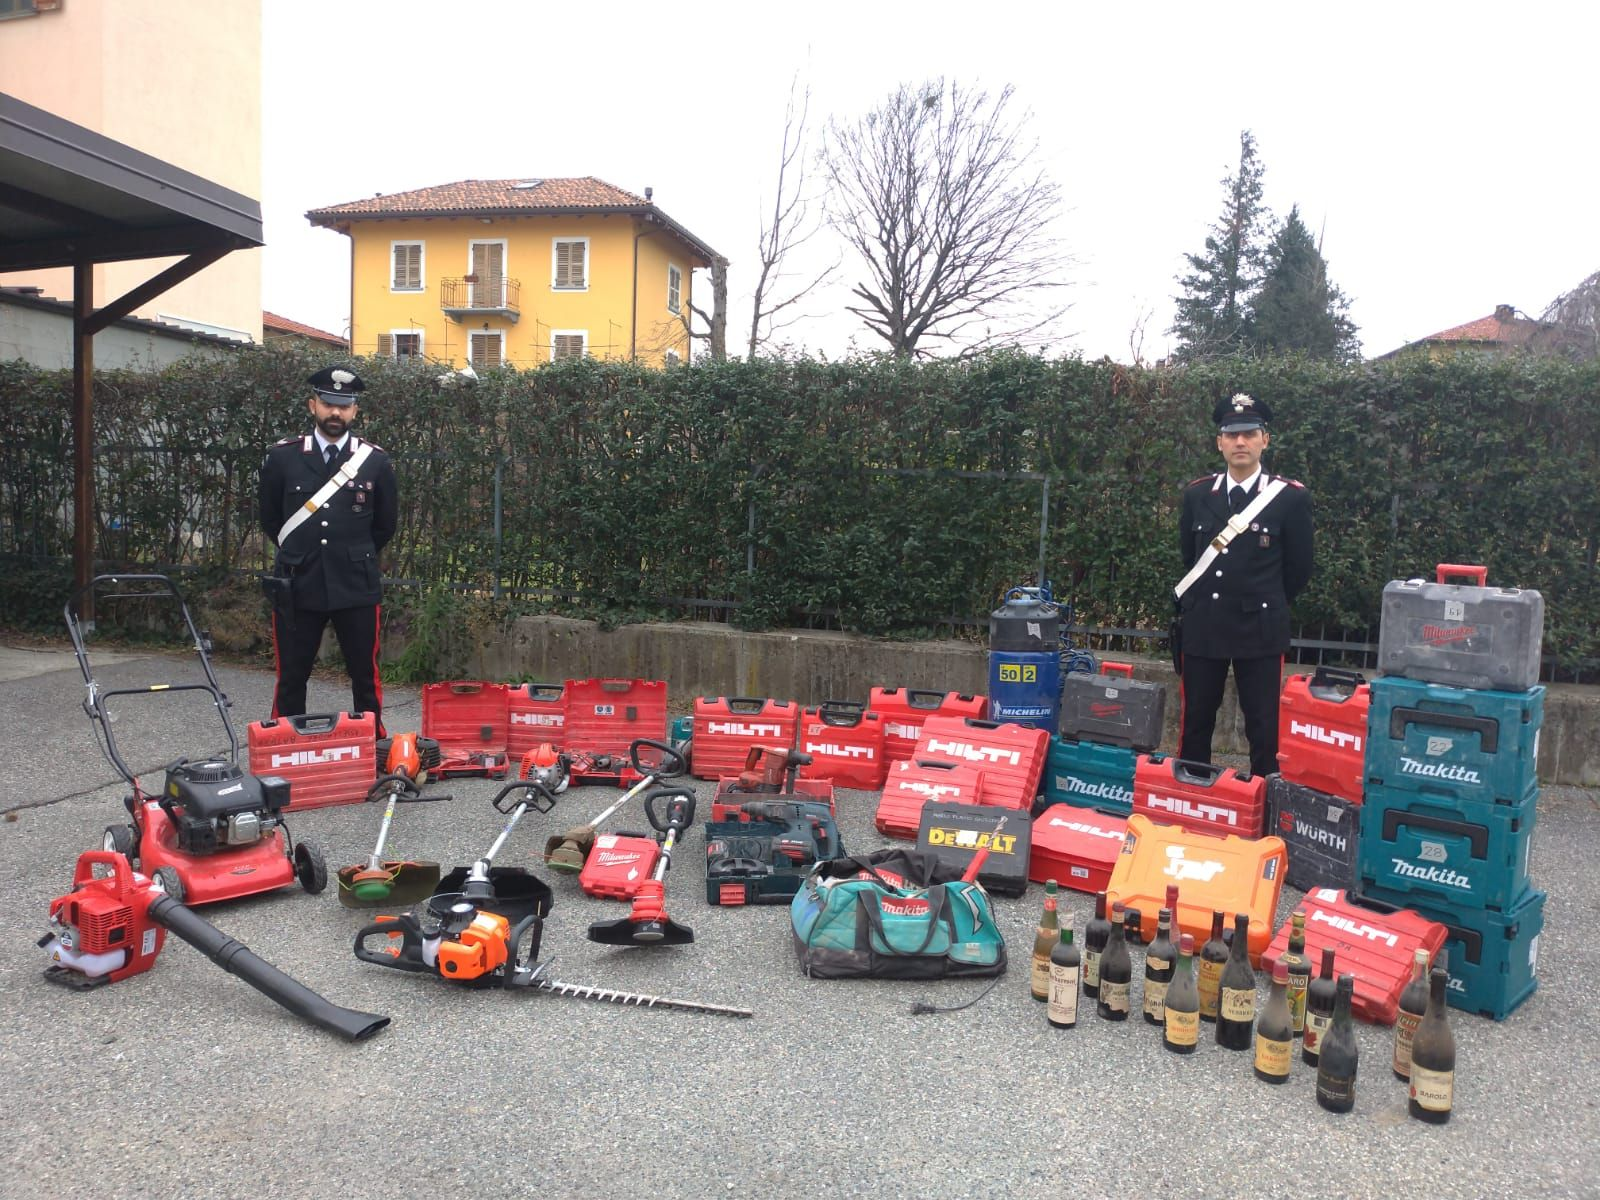 CIRIE' - 25mila euro di tagliaerba rubati in garage: 42enne nei guai